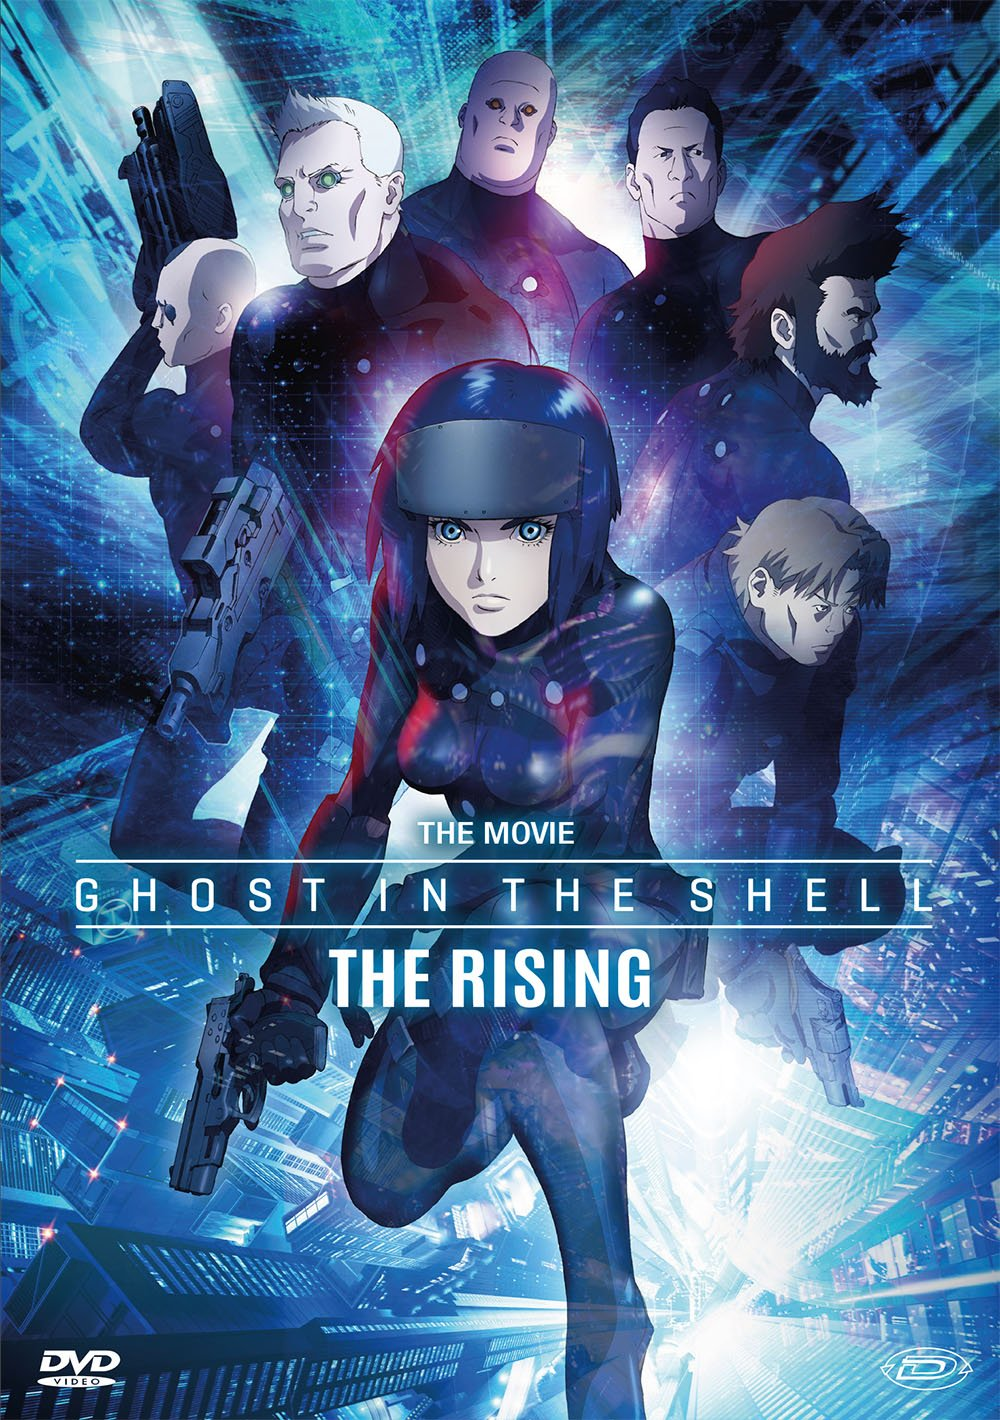 Ghost In The Shell - The Rising [Italia] [DVD]: Amazon.es: Kazuya Nomura, Kazuya Nomura: Cine y Series TV